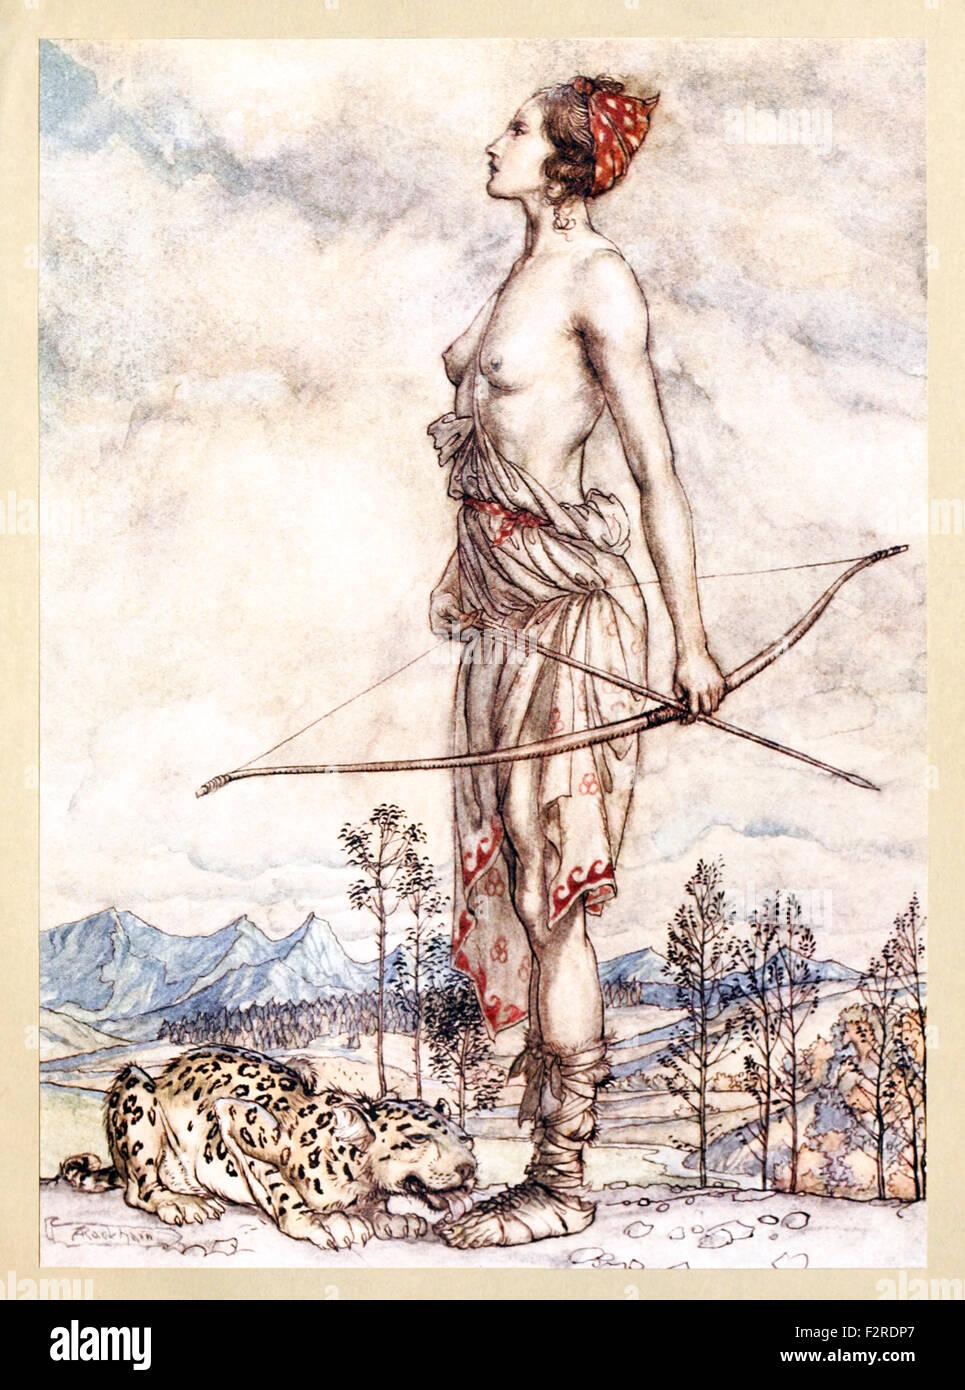 'The Huntress Dian' from 'Comus' by John Milton, illustration by Arthur Rackham (1867-1939). See description for Stock Photo